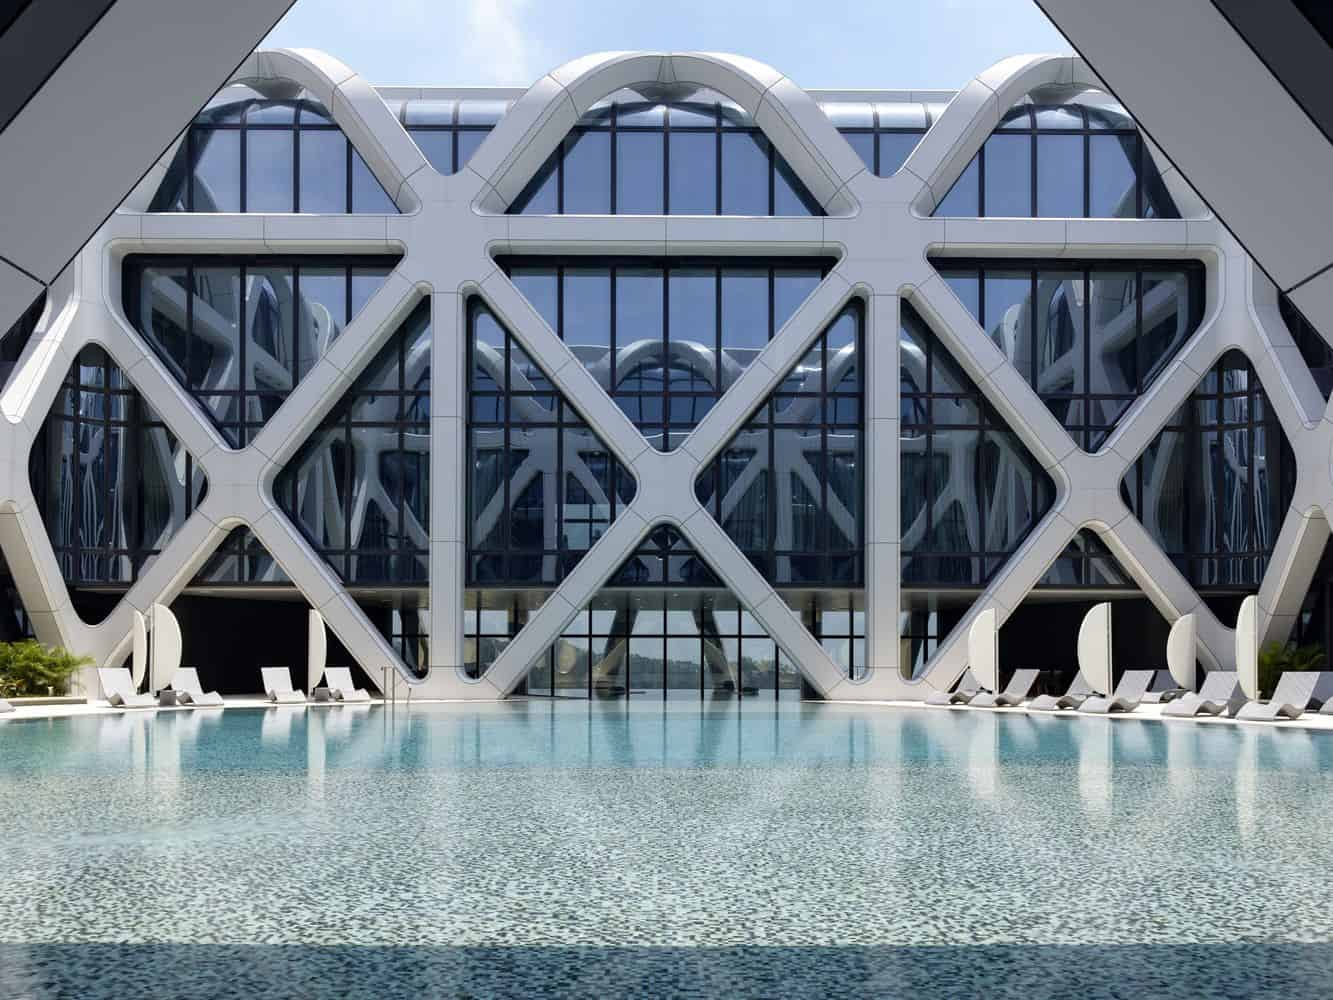 morpheus hotel zaha hadid architects 13